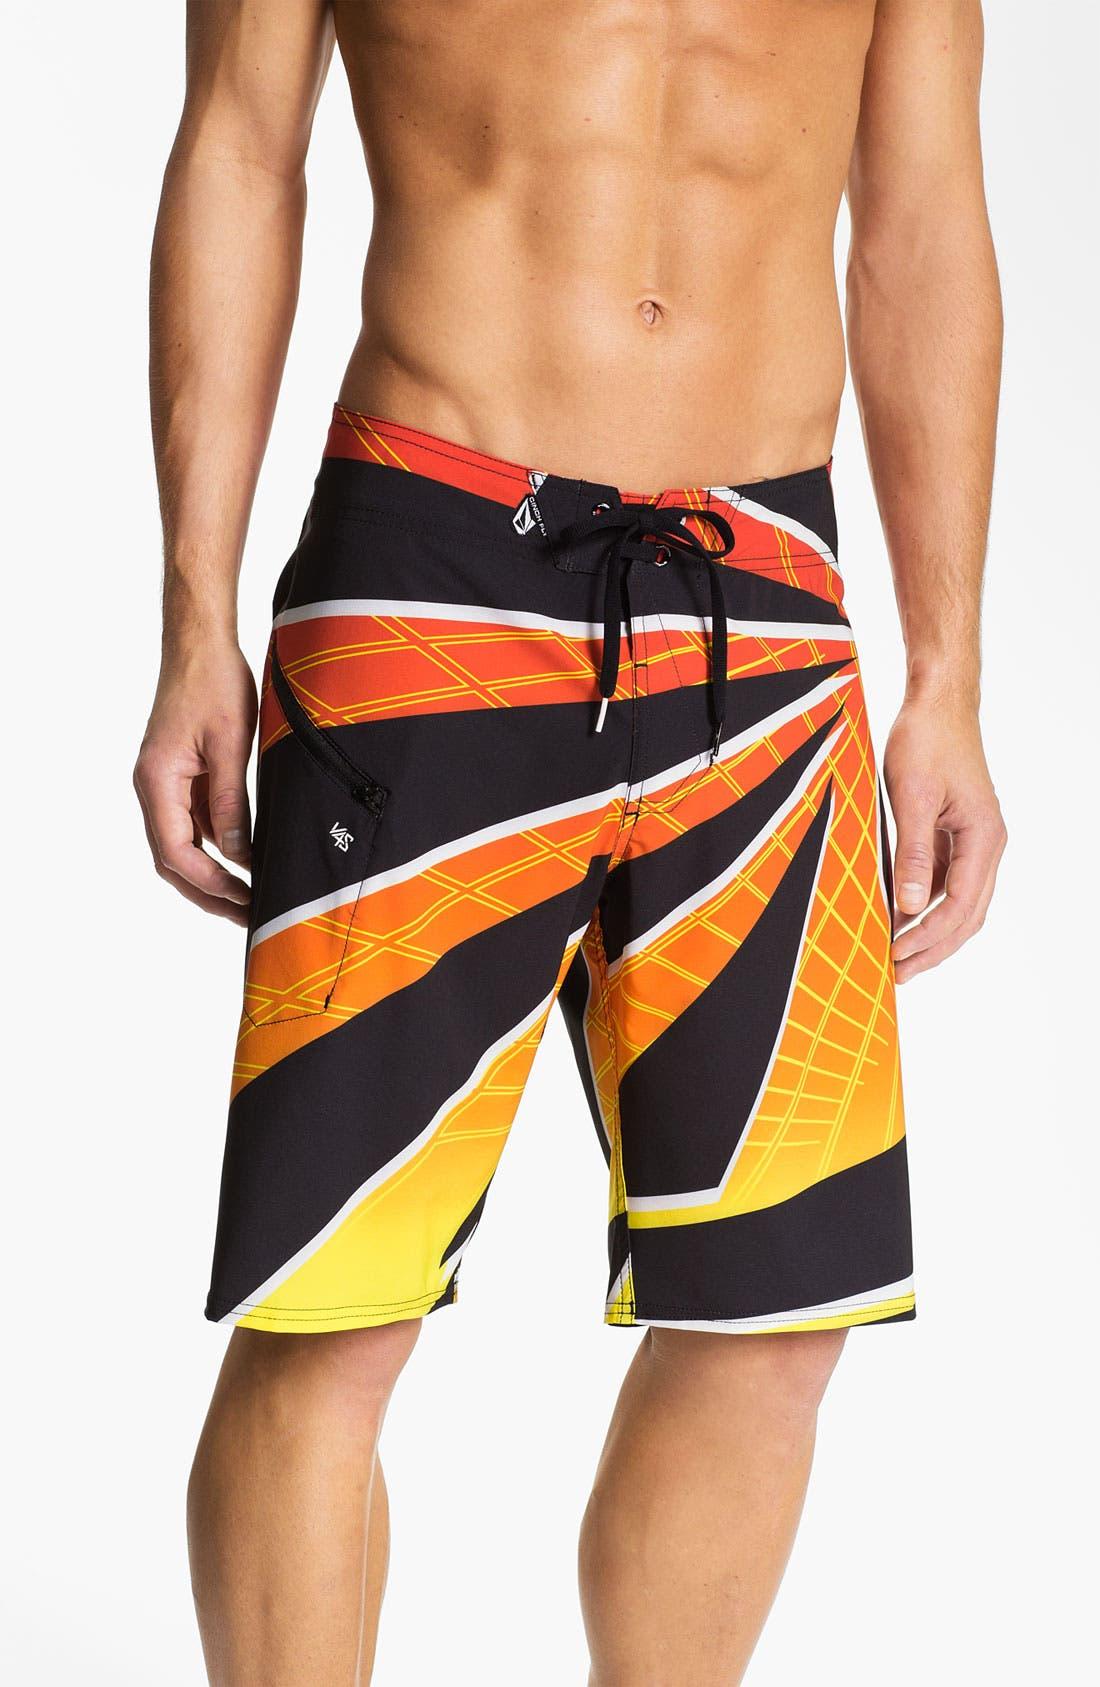 Alternate Image 1 Selected - Volcom 'Fiji Pro' Board Shorts